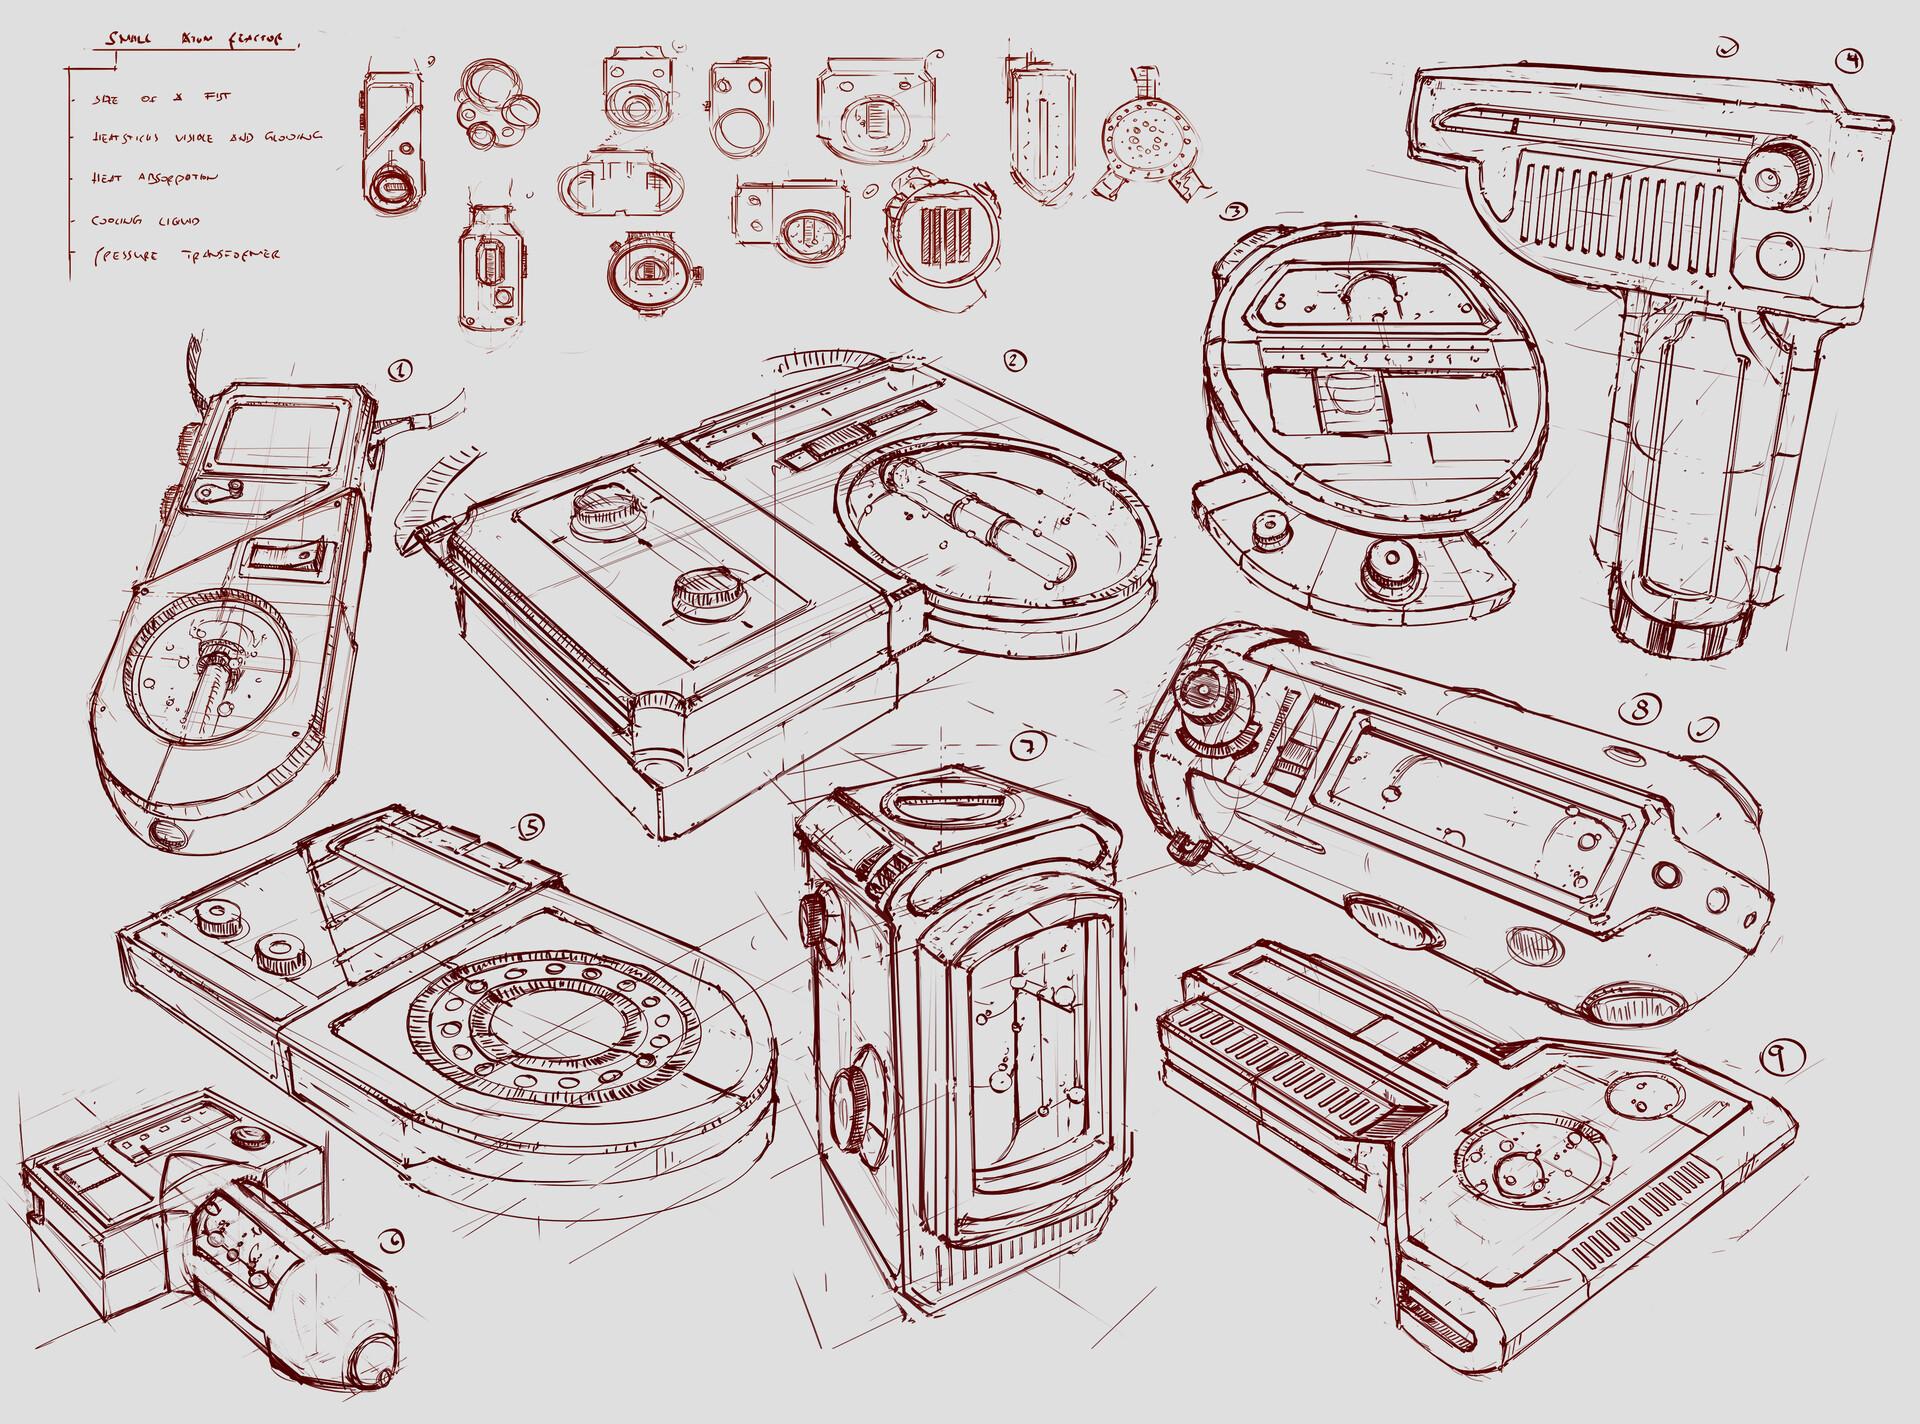 Max schiller 190810 thefoundation smallatomreactordesign ideation v01 web